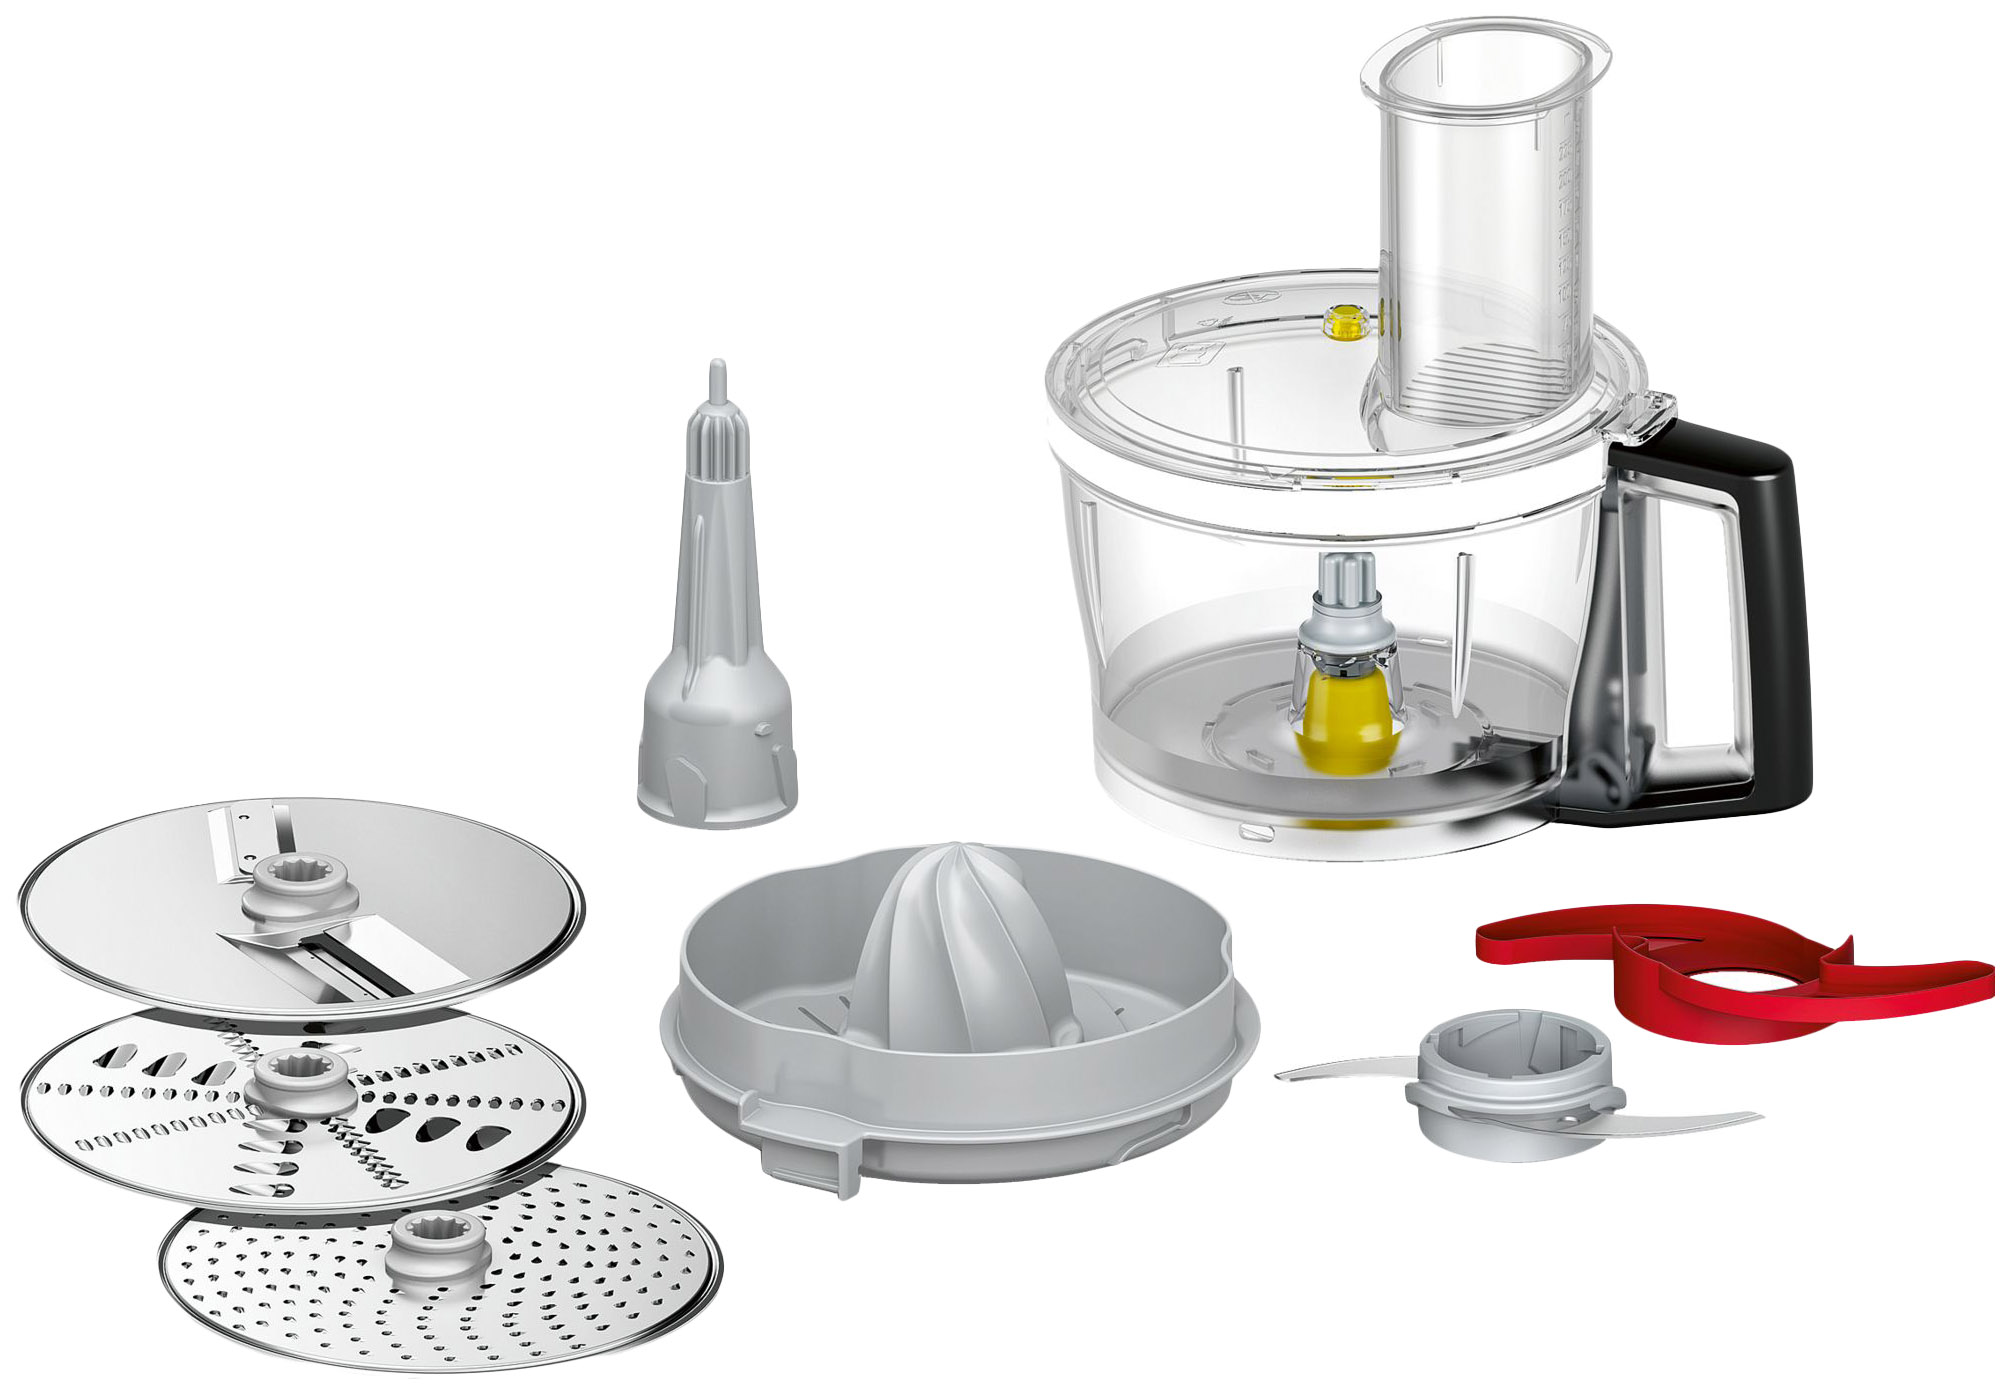 Насадка для кухонного комбайна Bosch VeggieLove Plus